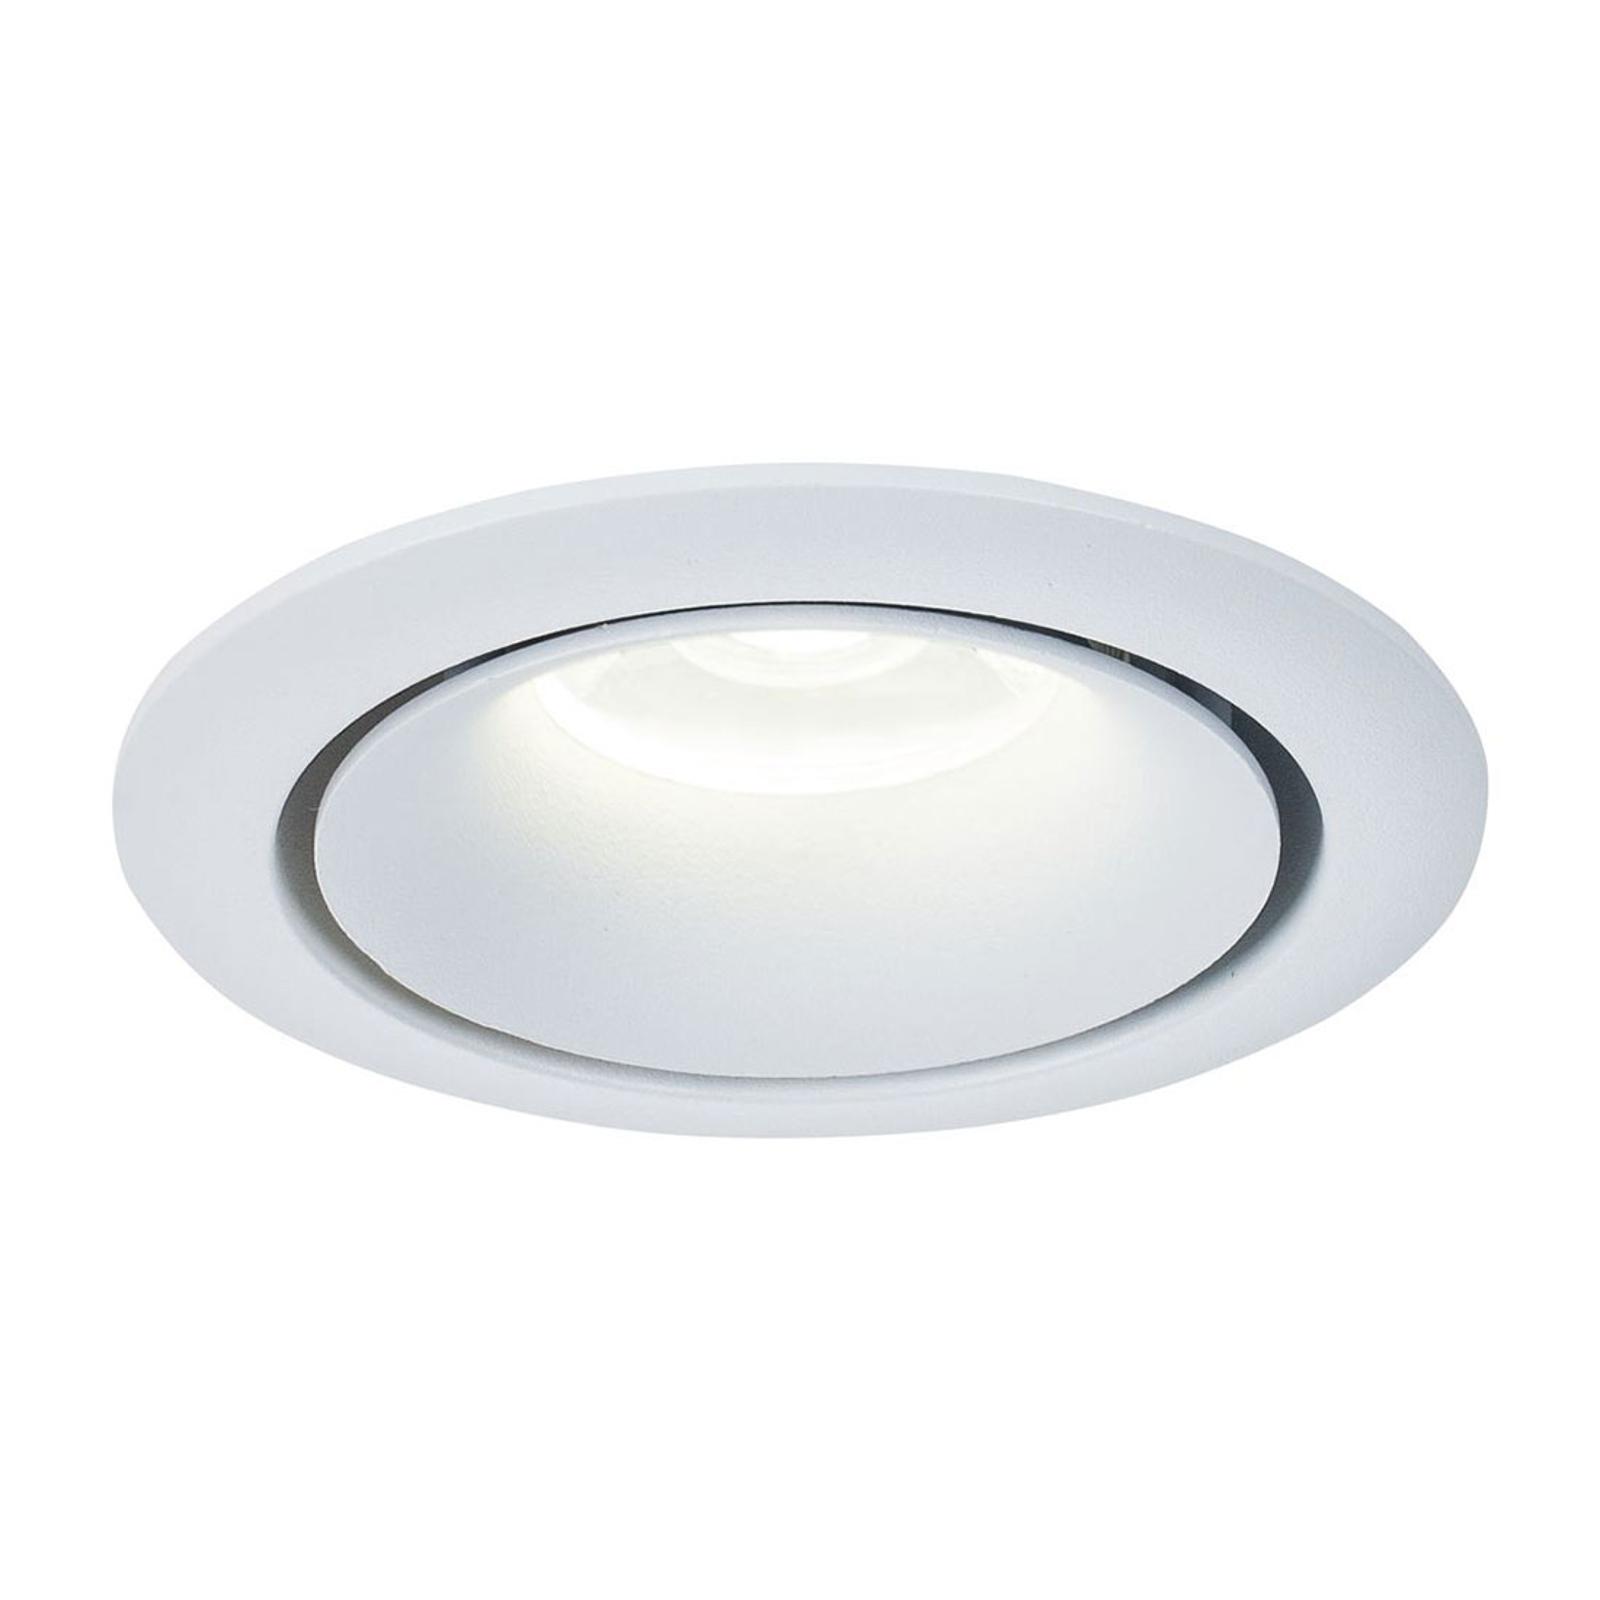 Einbaustrahler Yin mit Aluminiumrahmen in Weiß